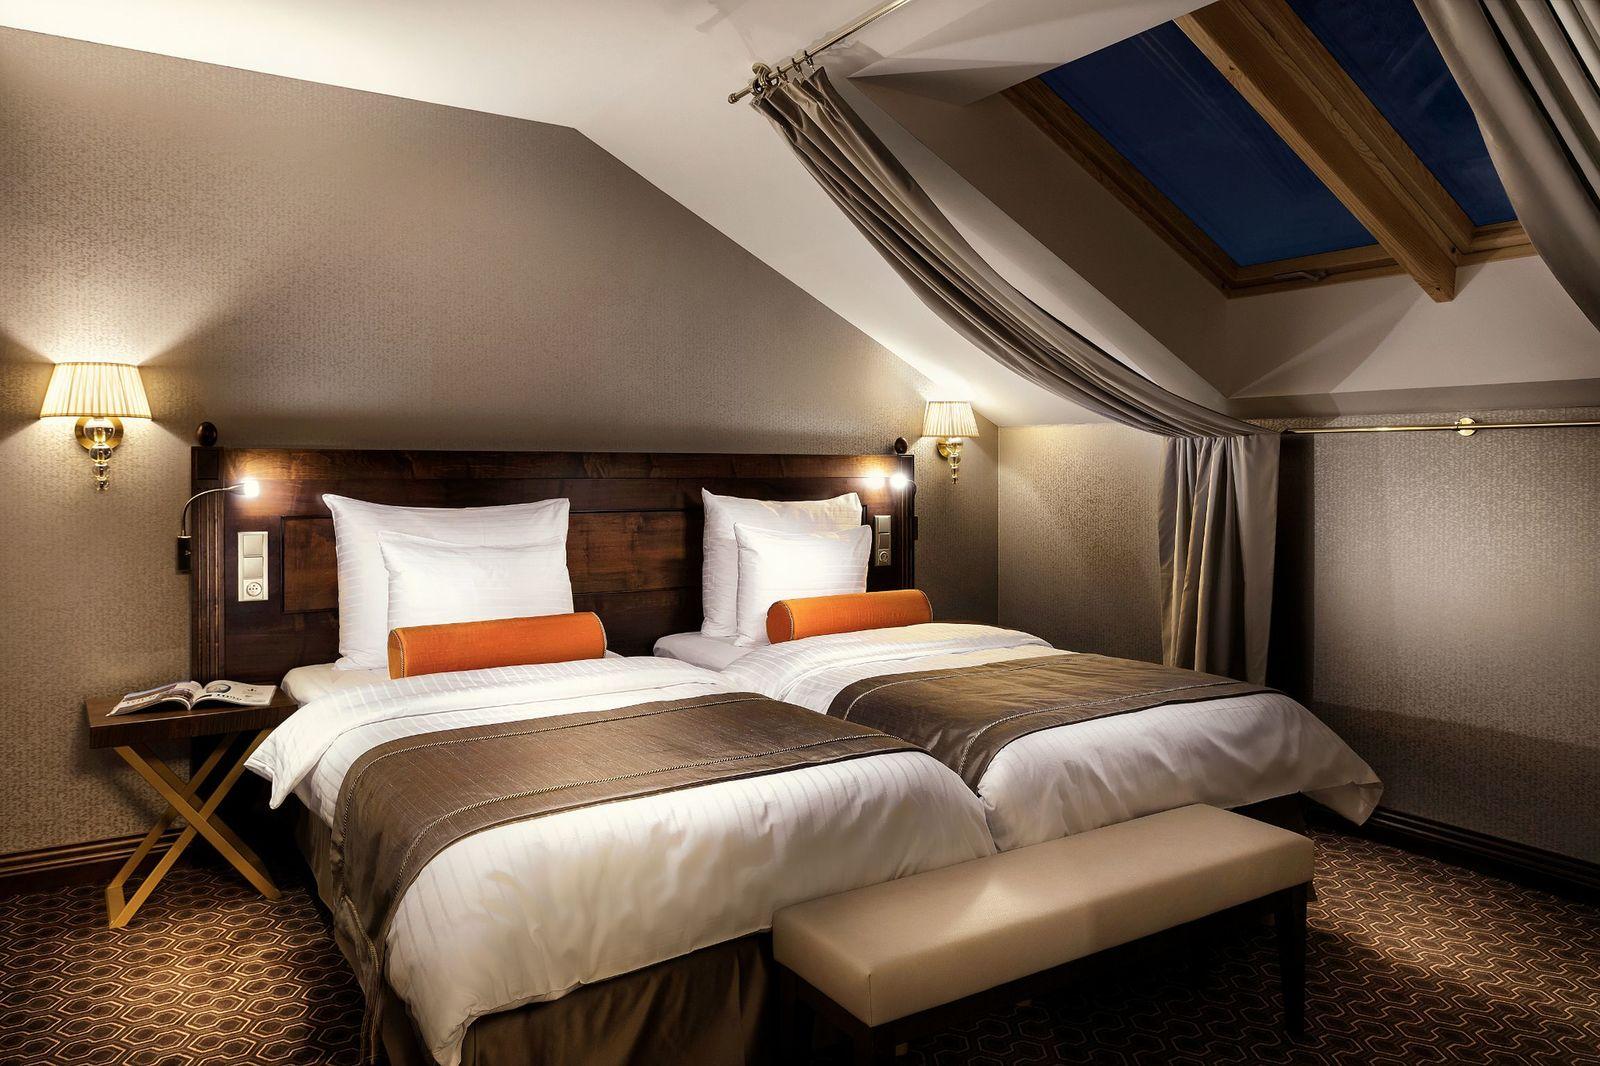 Prague Bedroom Furniture Rooms Suites Cosmopolitan Hotel